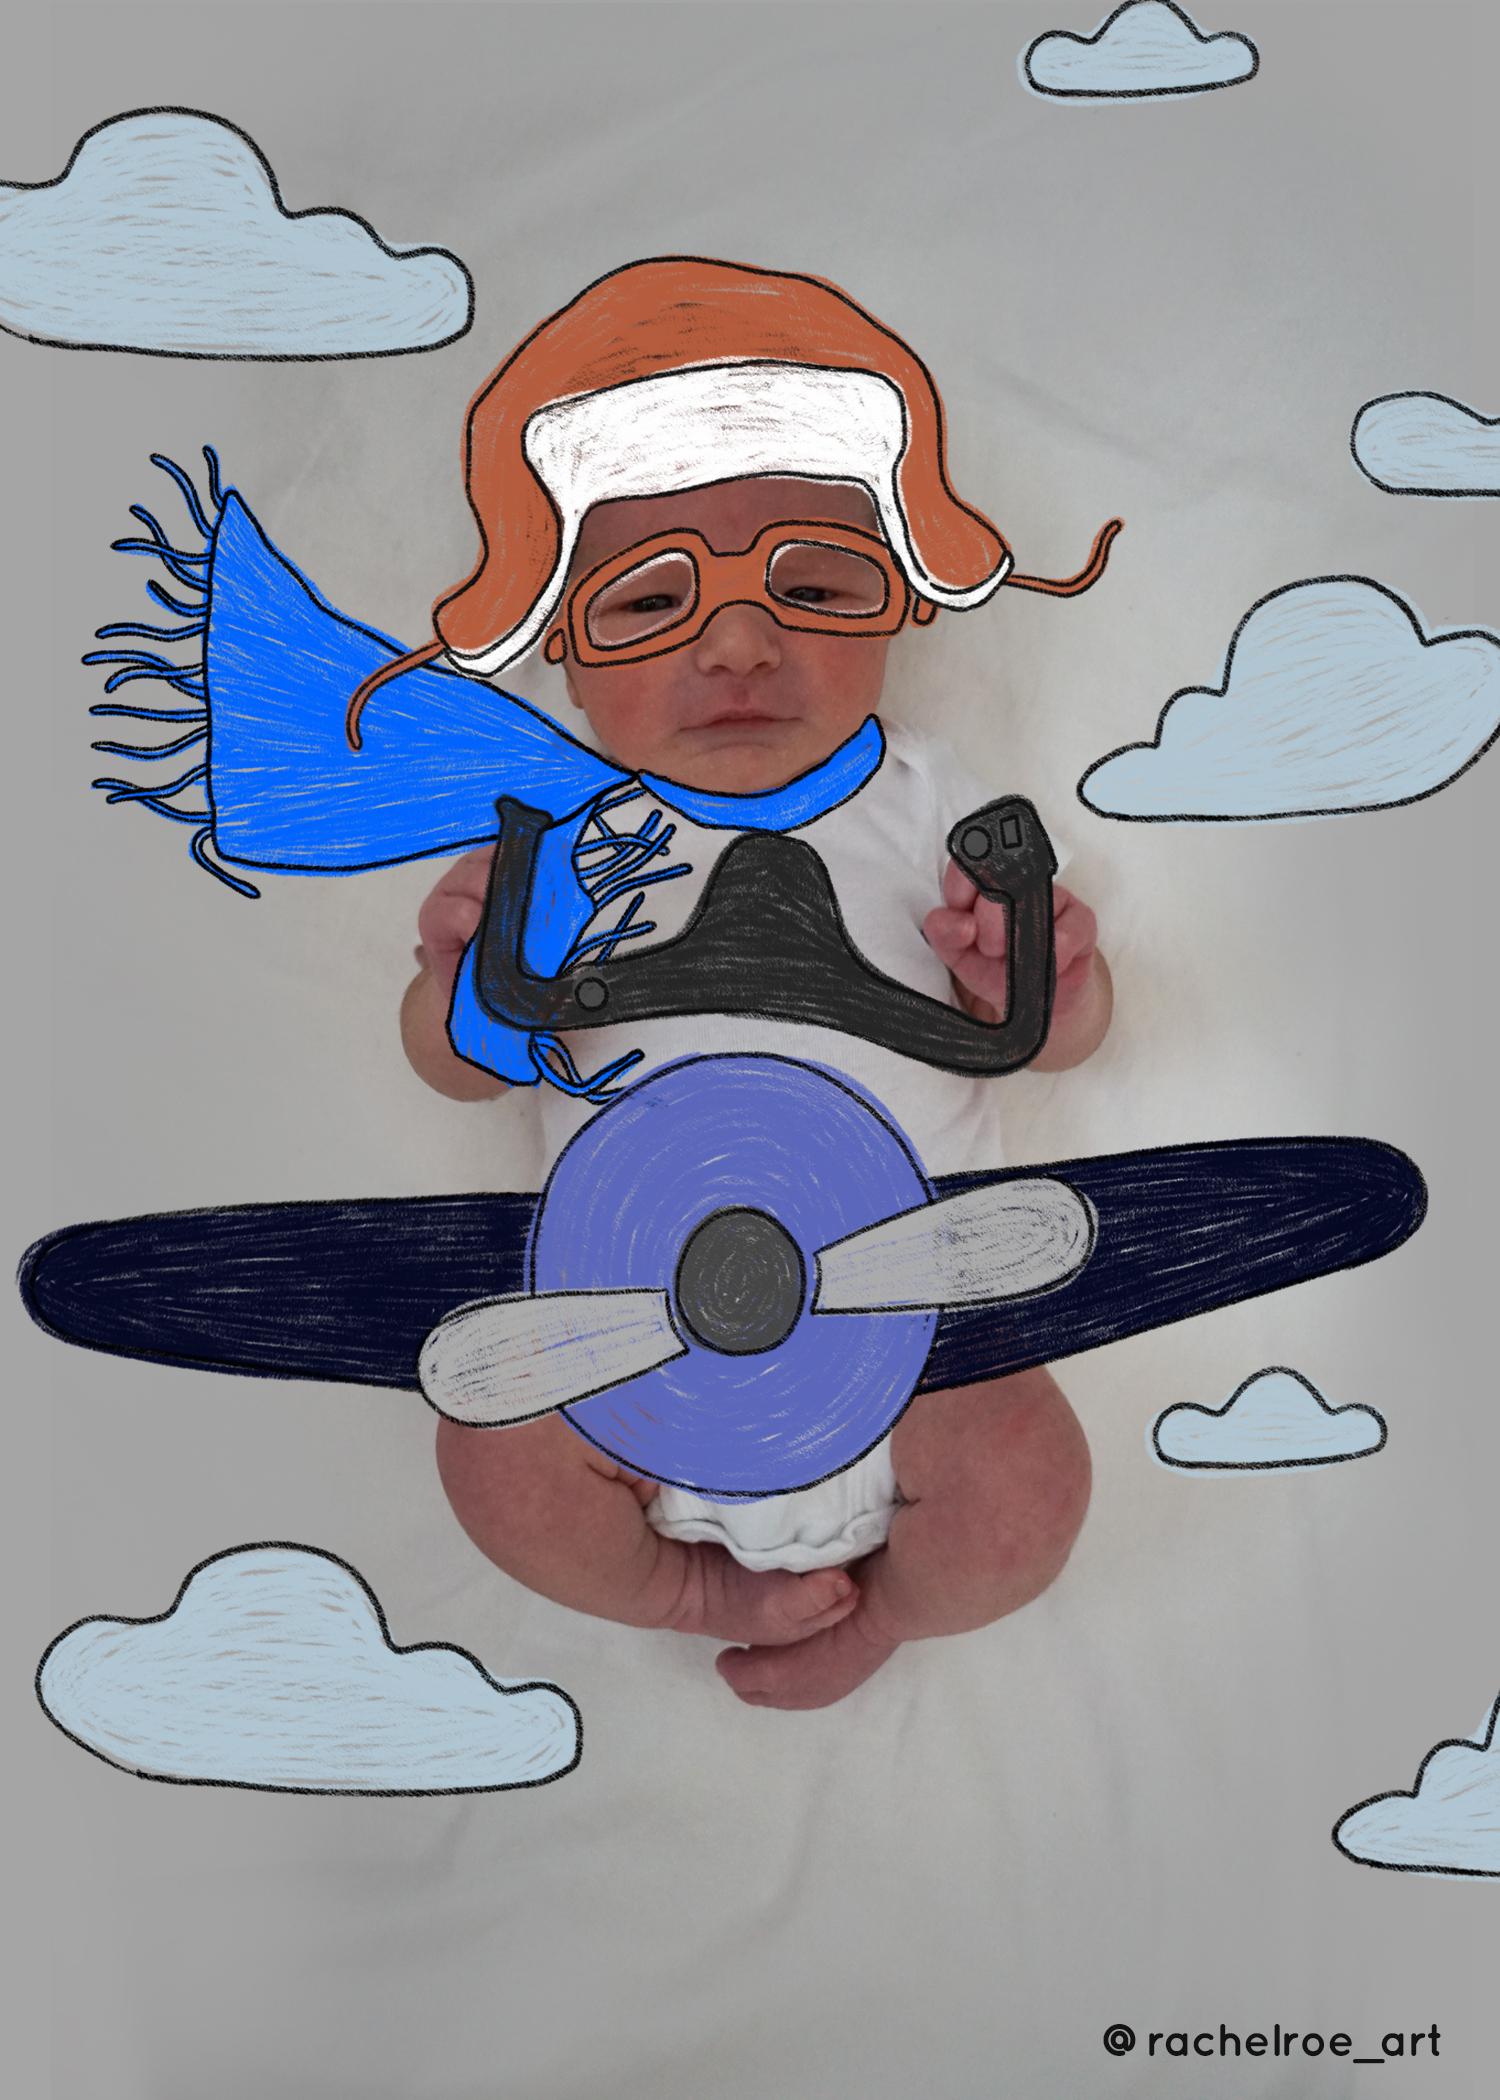 Baby Announcement Illustration_Pilot_Rachel Roe.jpg